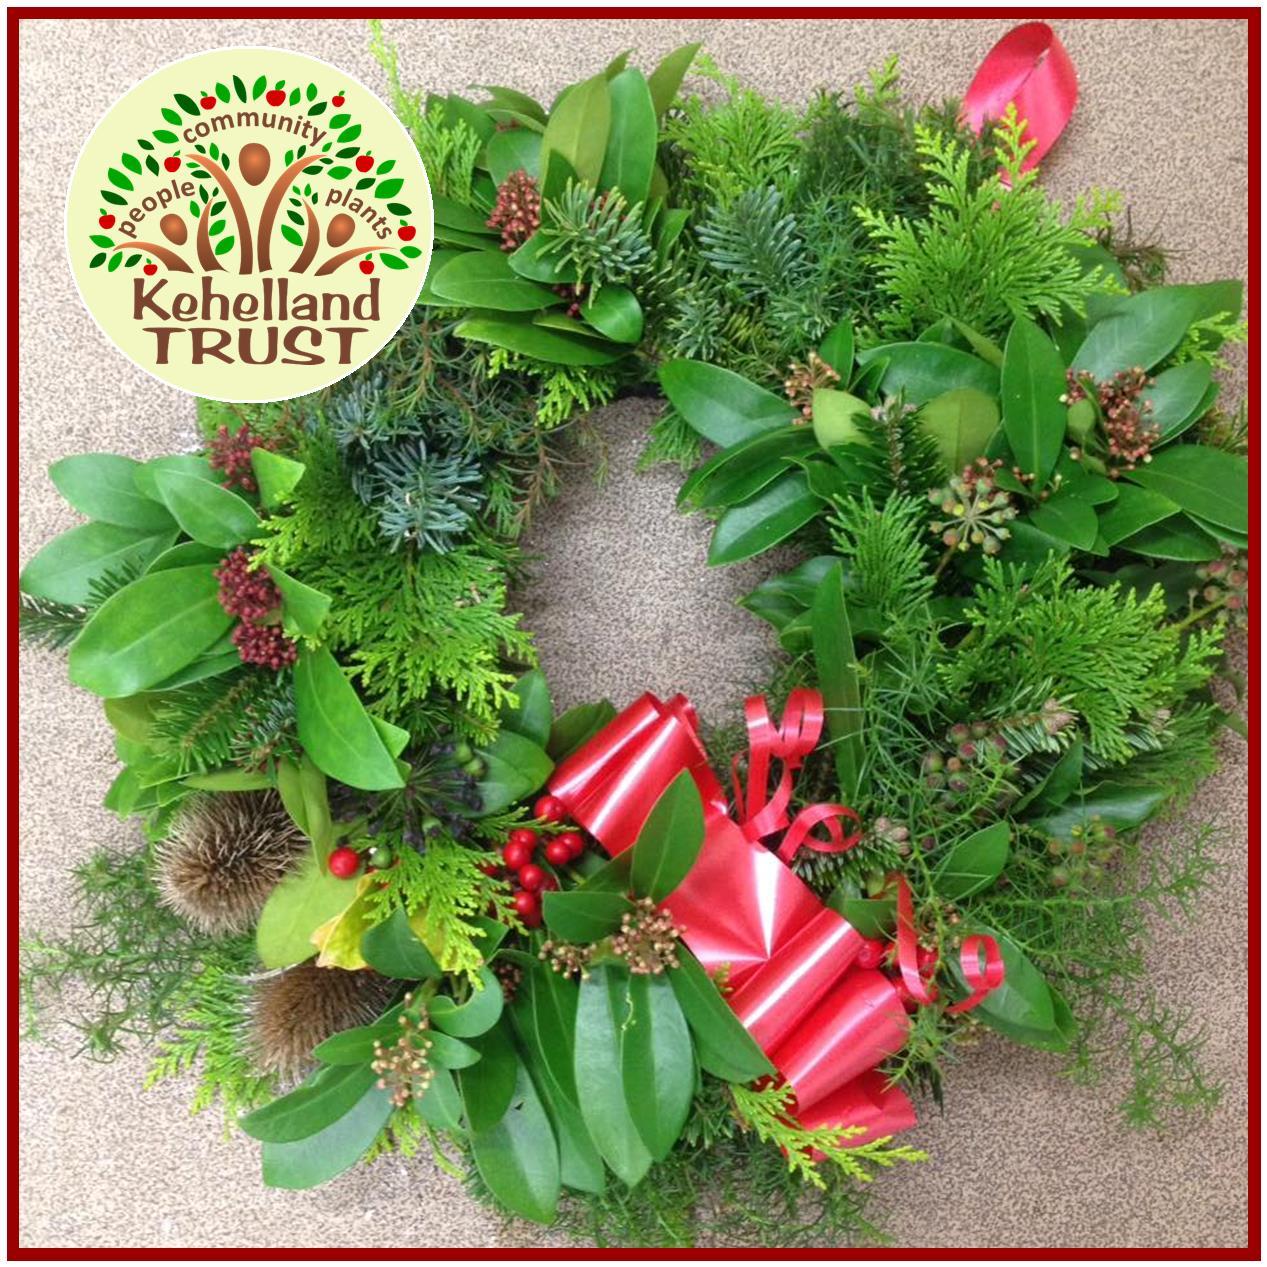 COMMUNITY: Wreath Making Workshop